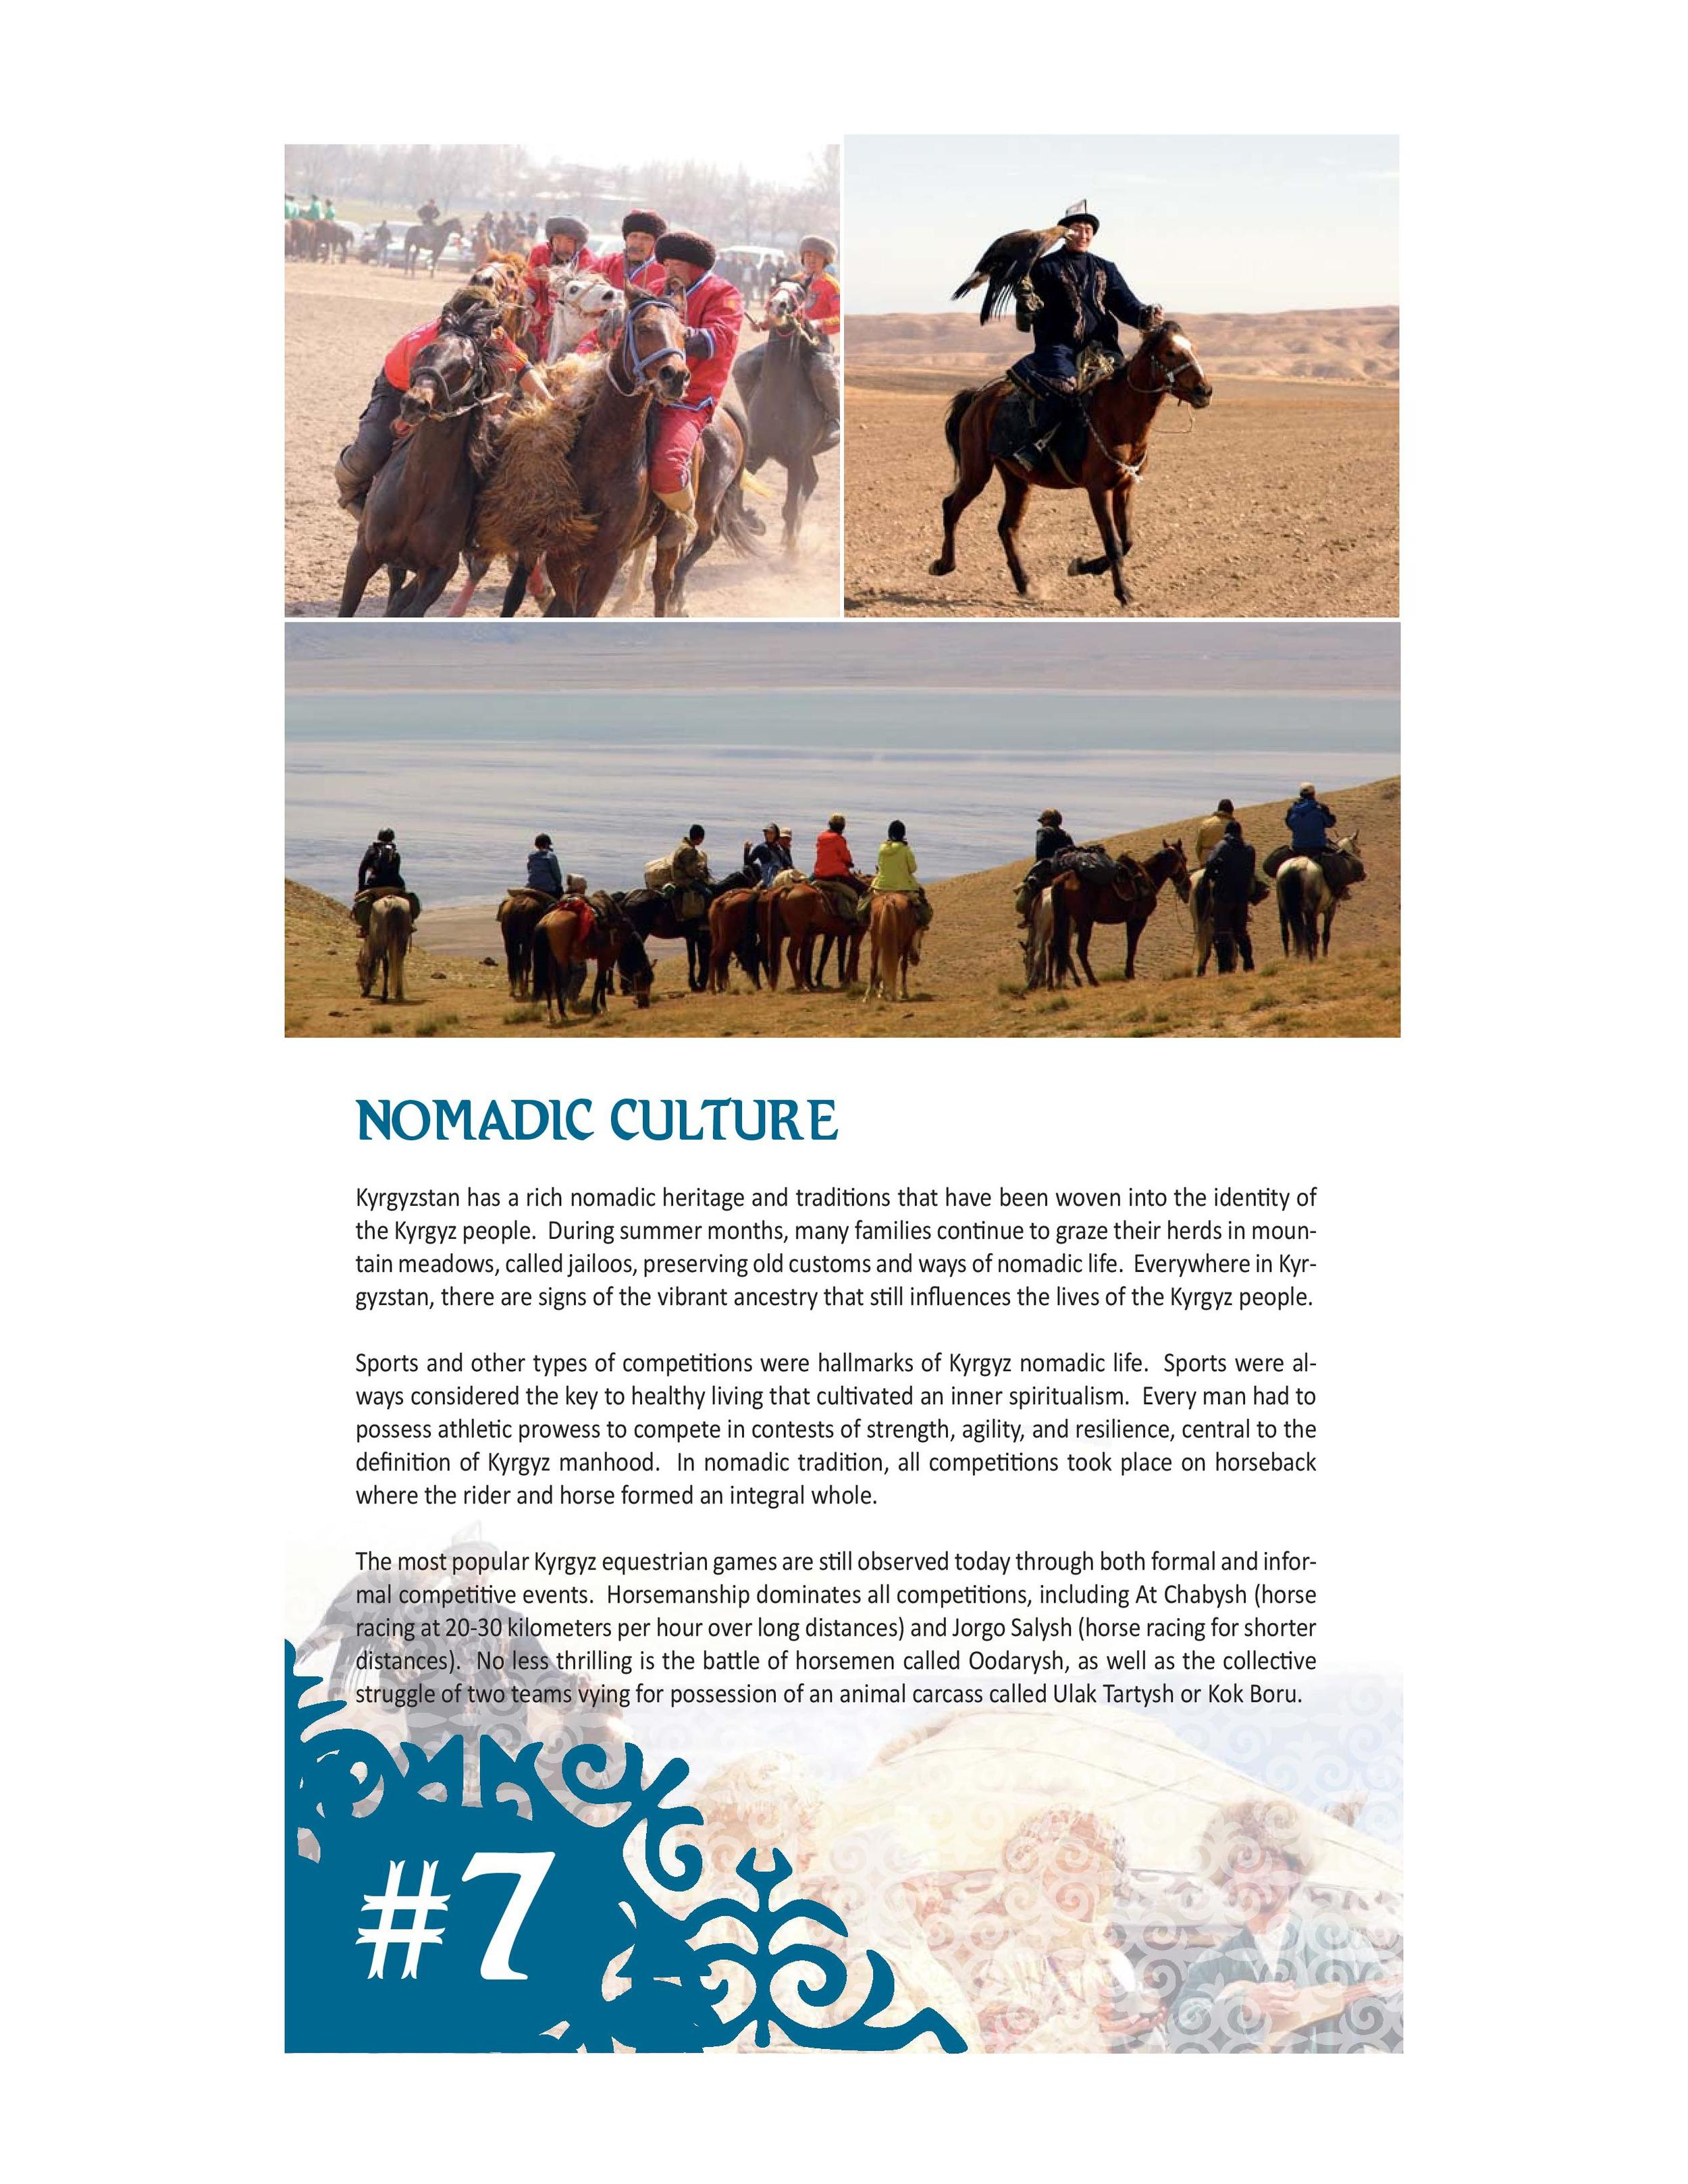 10 reasons to explore Kyrgyzstan_SMALL-page-008.jpg